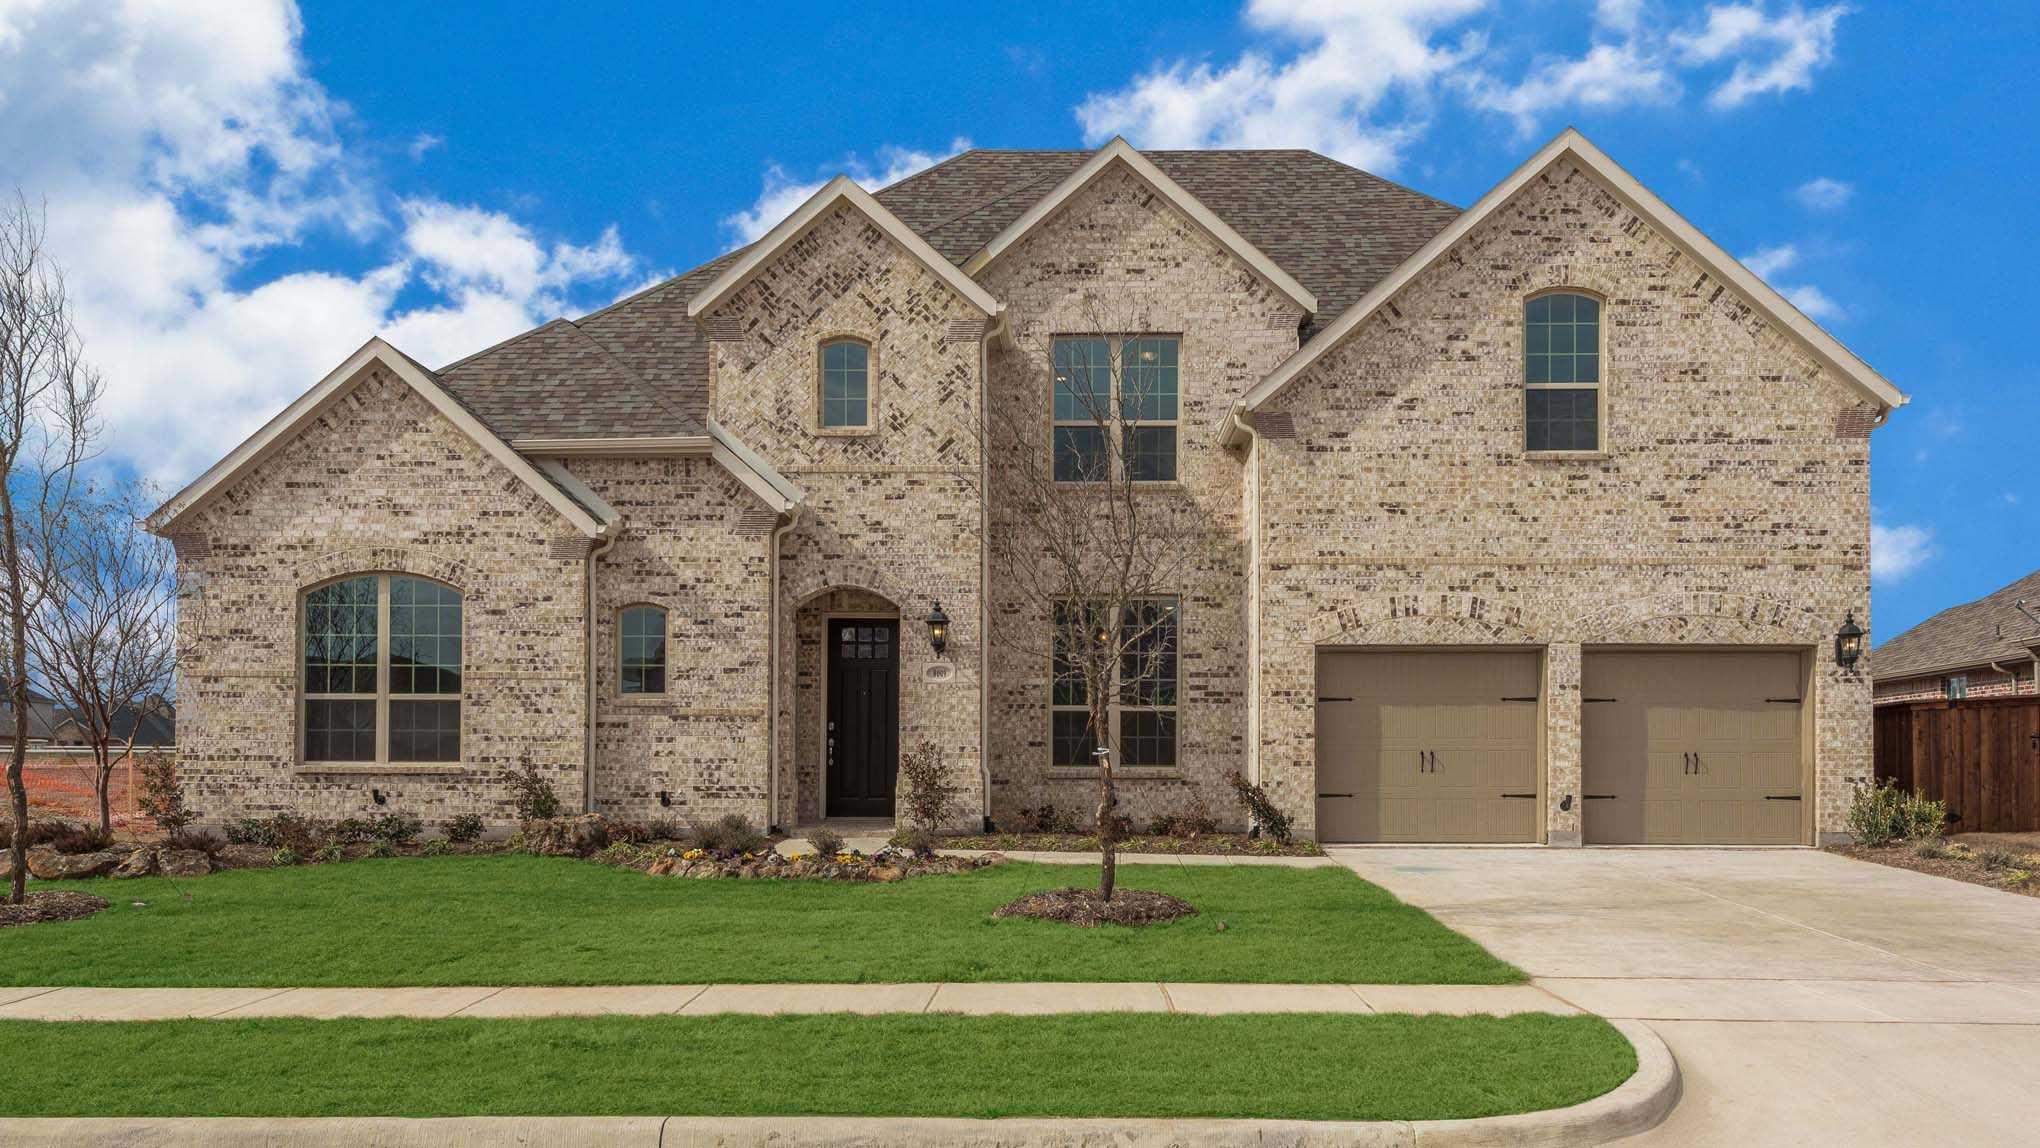 8009 Three Forks Trail, McKinney, TX Homes & Land - Real Estate